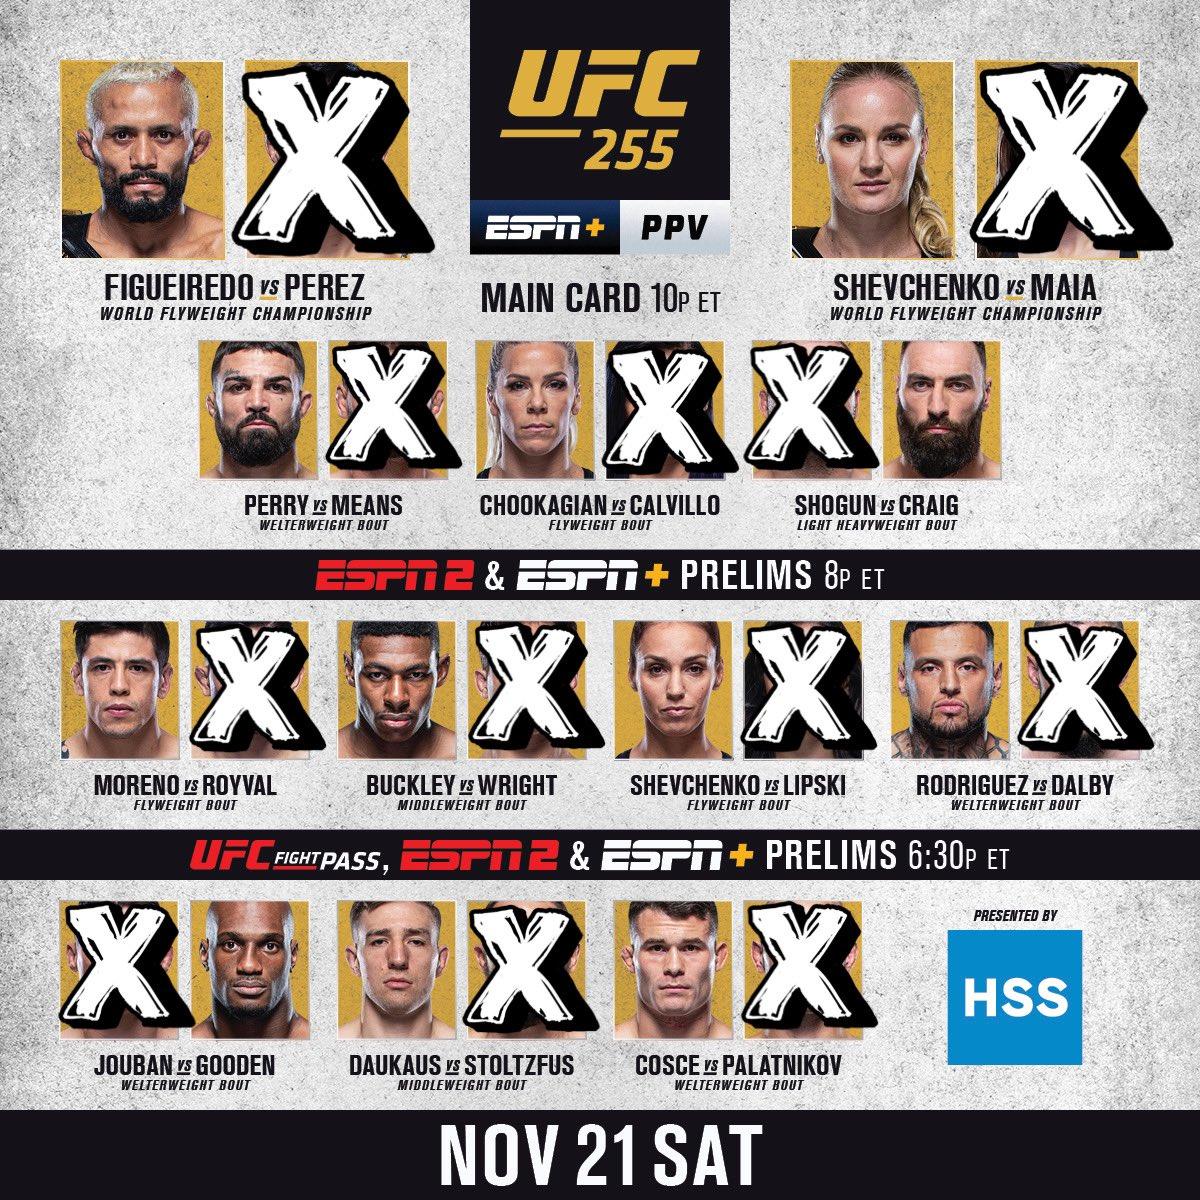 💰2020 #FightPick record:   • Overall: (265-145) | 64.63%  - Main Card: (115-81) | 58.67% - Prelims: (138-52) | 72.63% - Early Prelims: (12-12) | 50%   5️⃣ Draws:  • #UFCBrasilia  • #UFCVegas5  • #UFCVegas11  • #UFCFightIsland4  • #UFC254   1️⃣ No Contest: #UFC247 https://t.co/SQWlpAbjnG